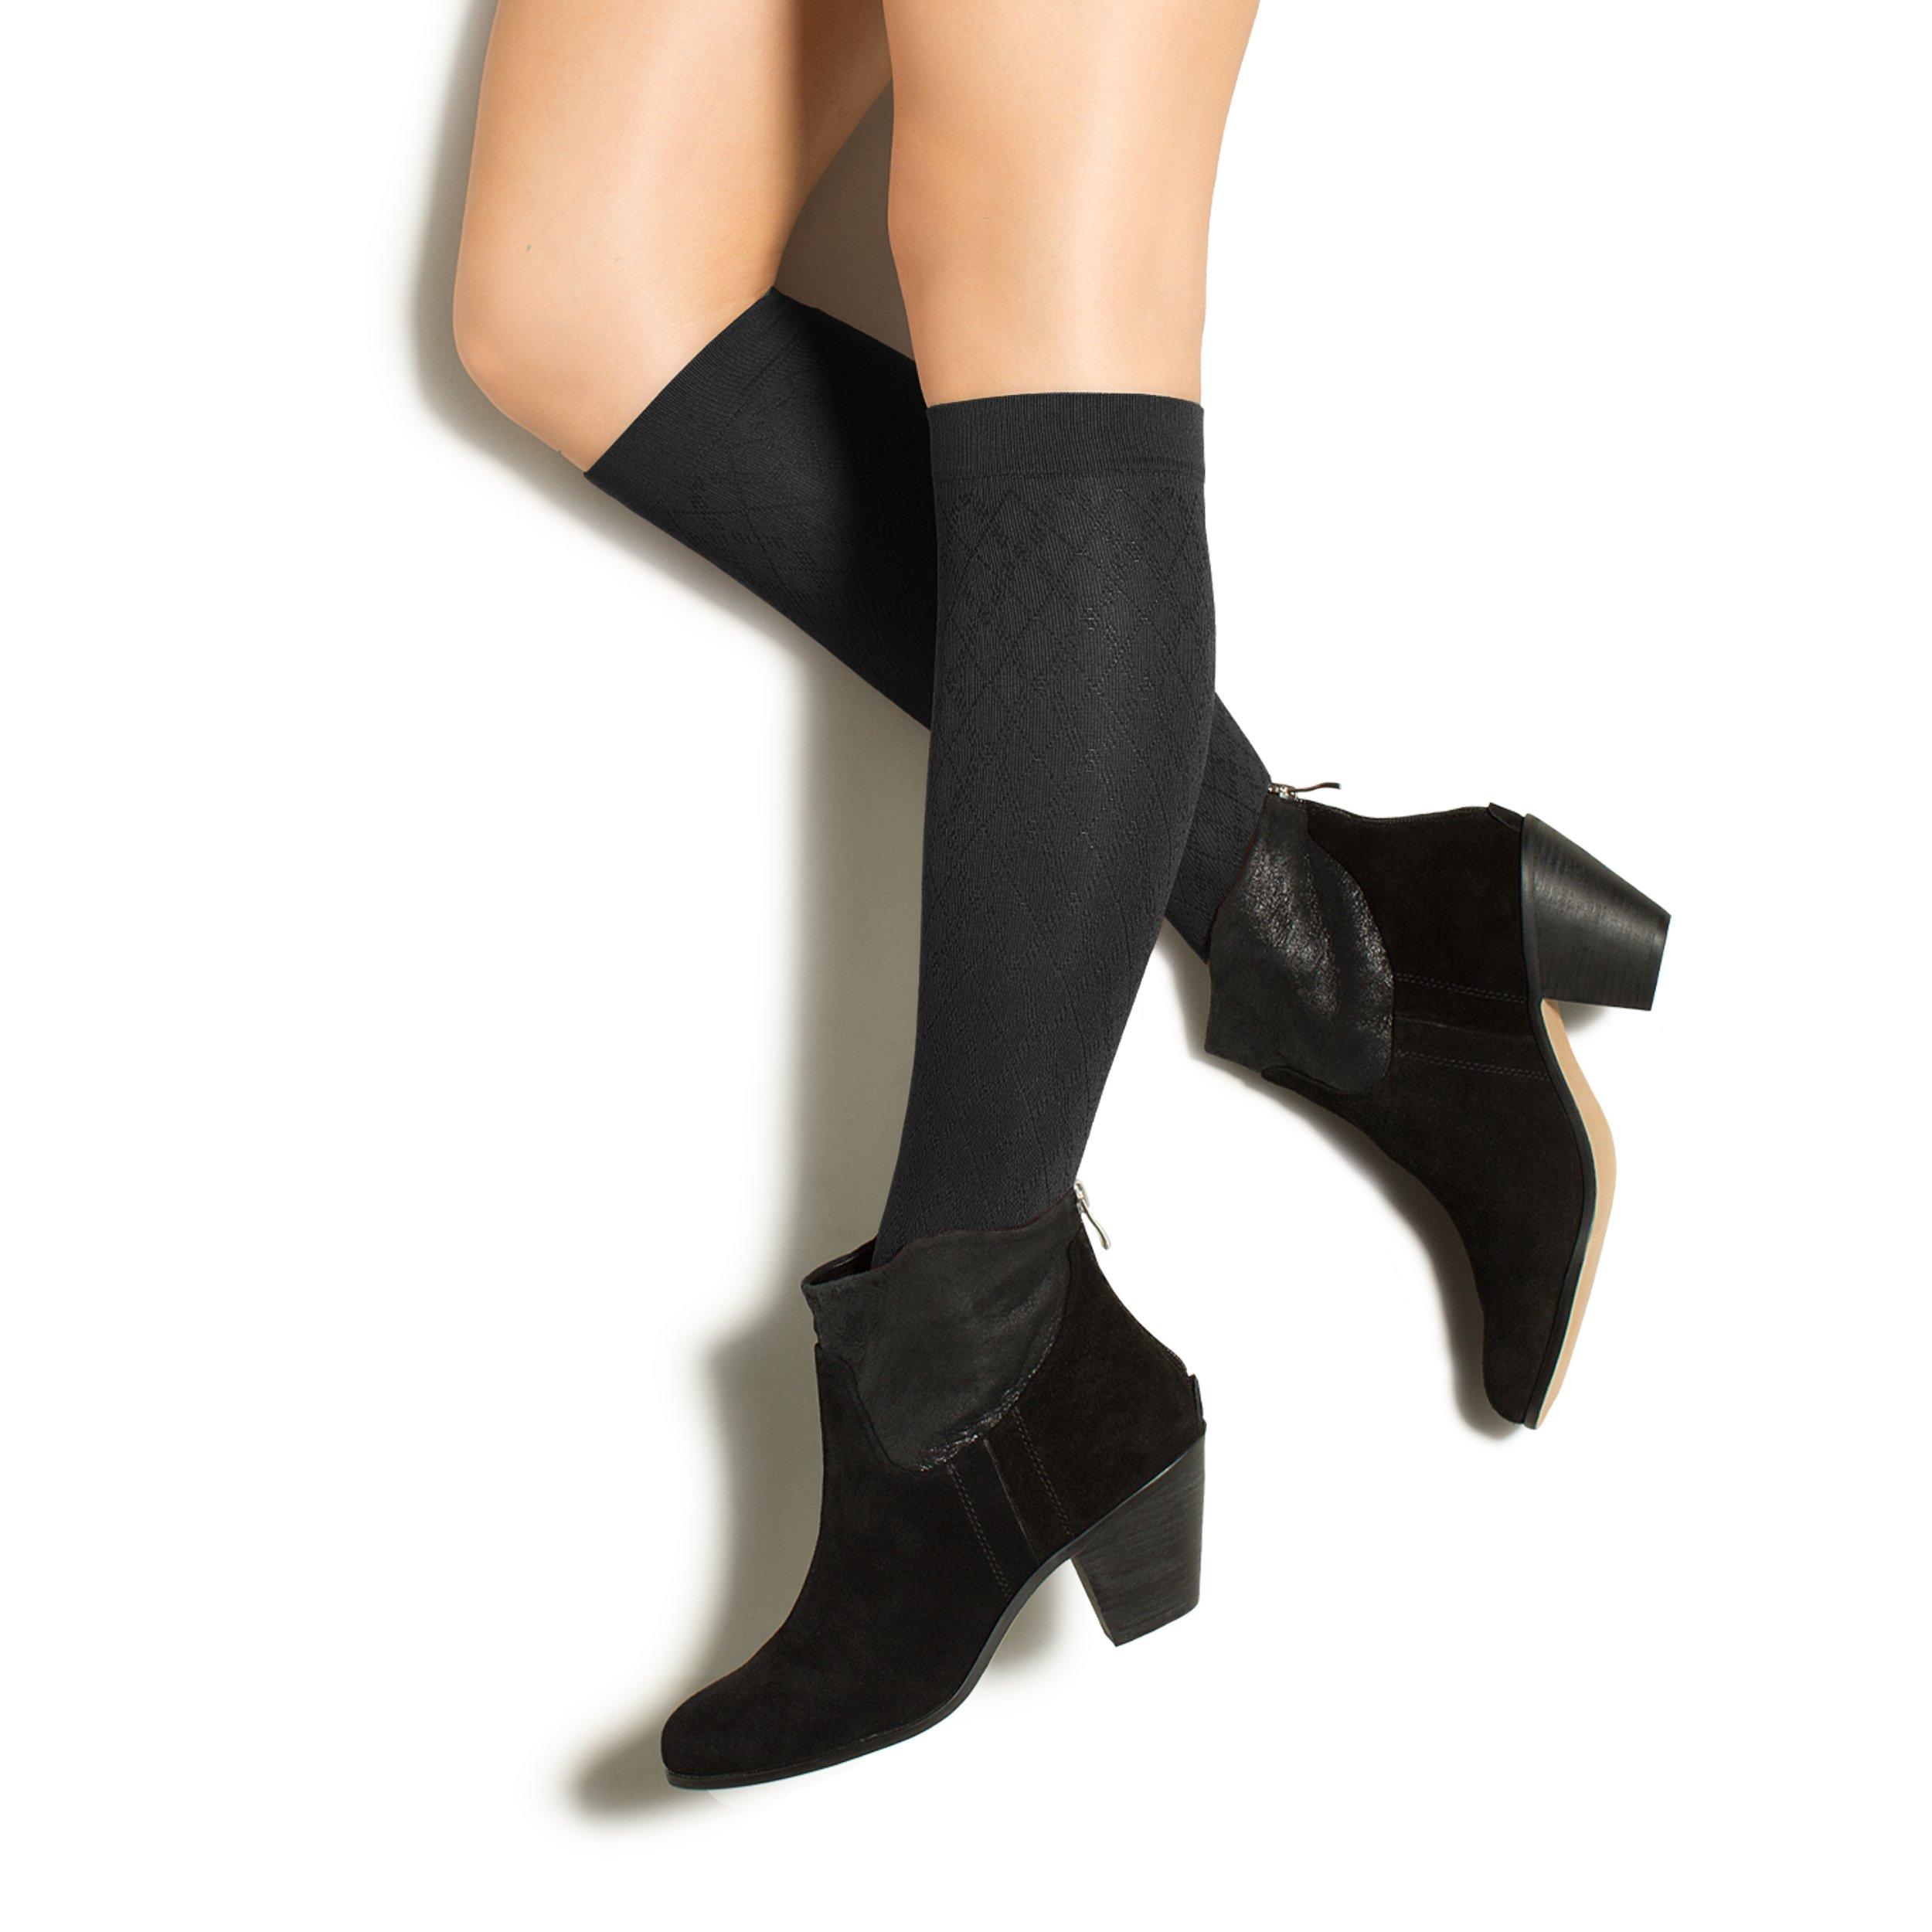 Therafirm LIGHT Women's Diamond Trouser Socks - 10-15mmHg Compression Dress Socks (Black, Small) by Therafirm (Image #1)